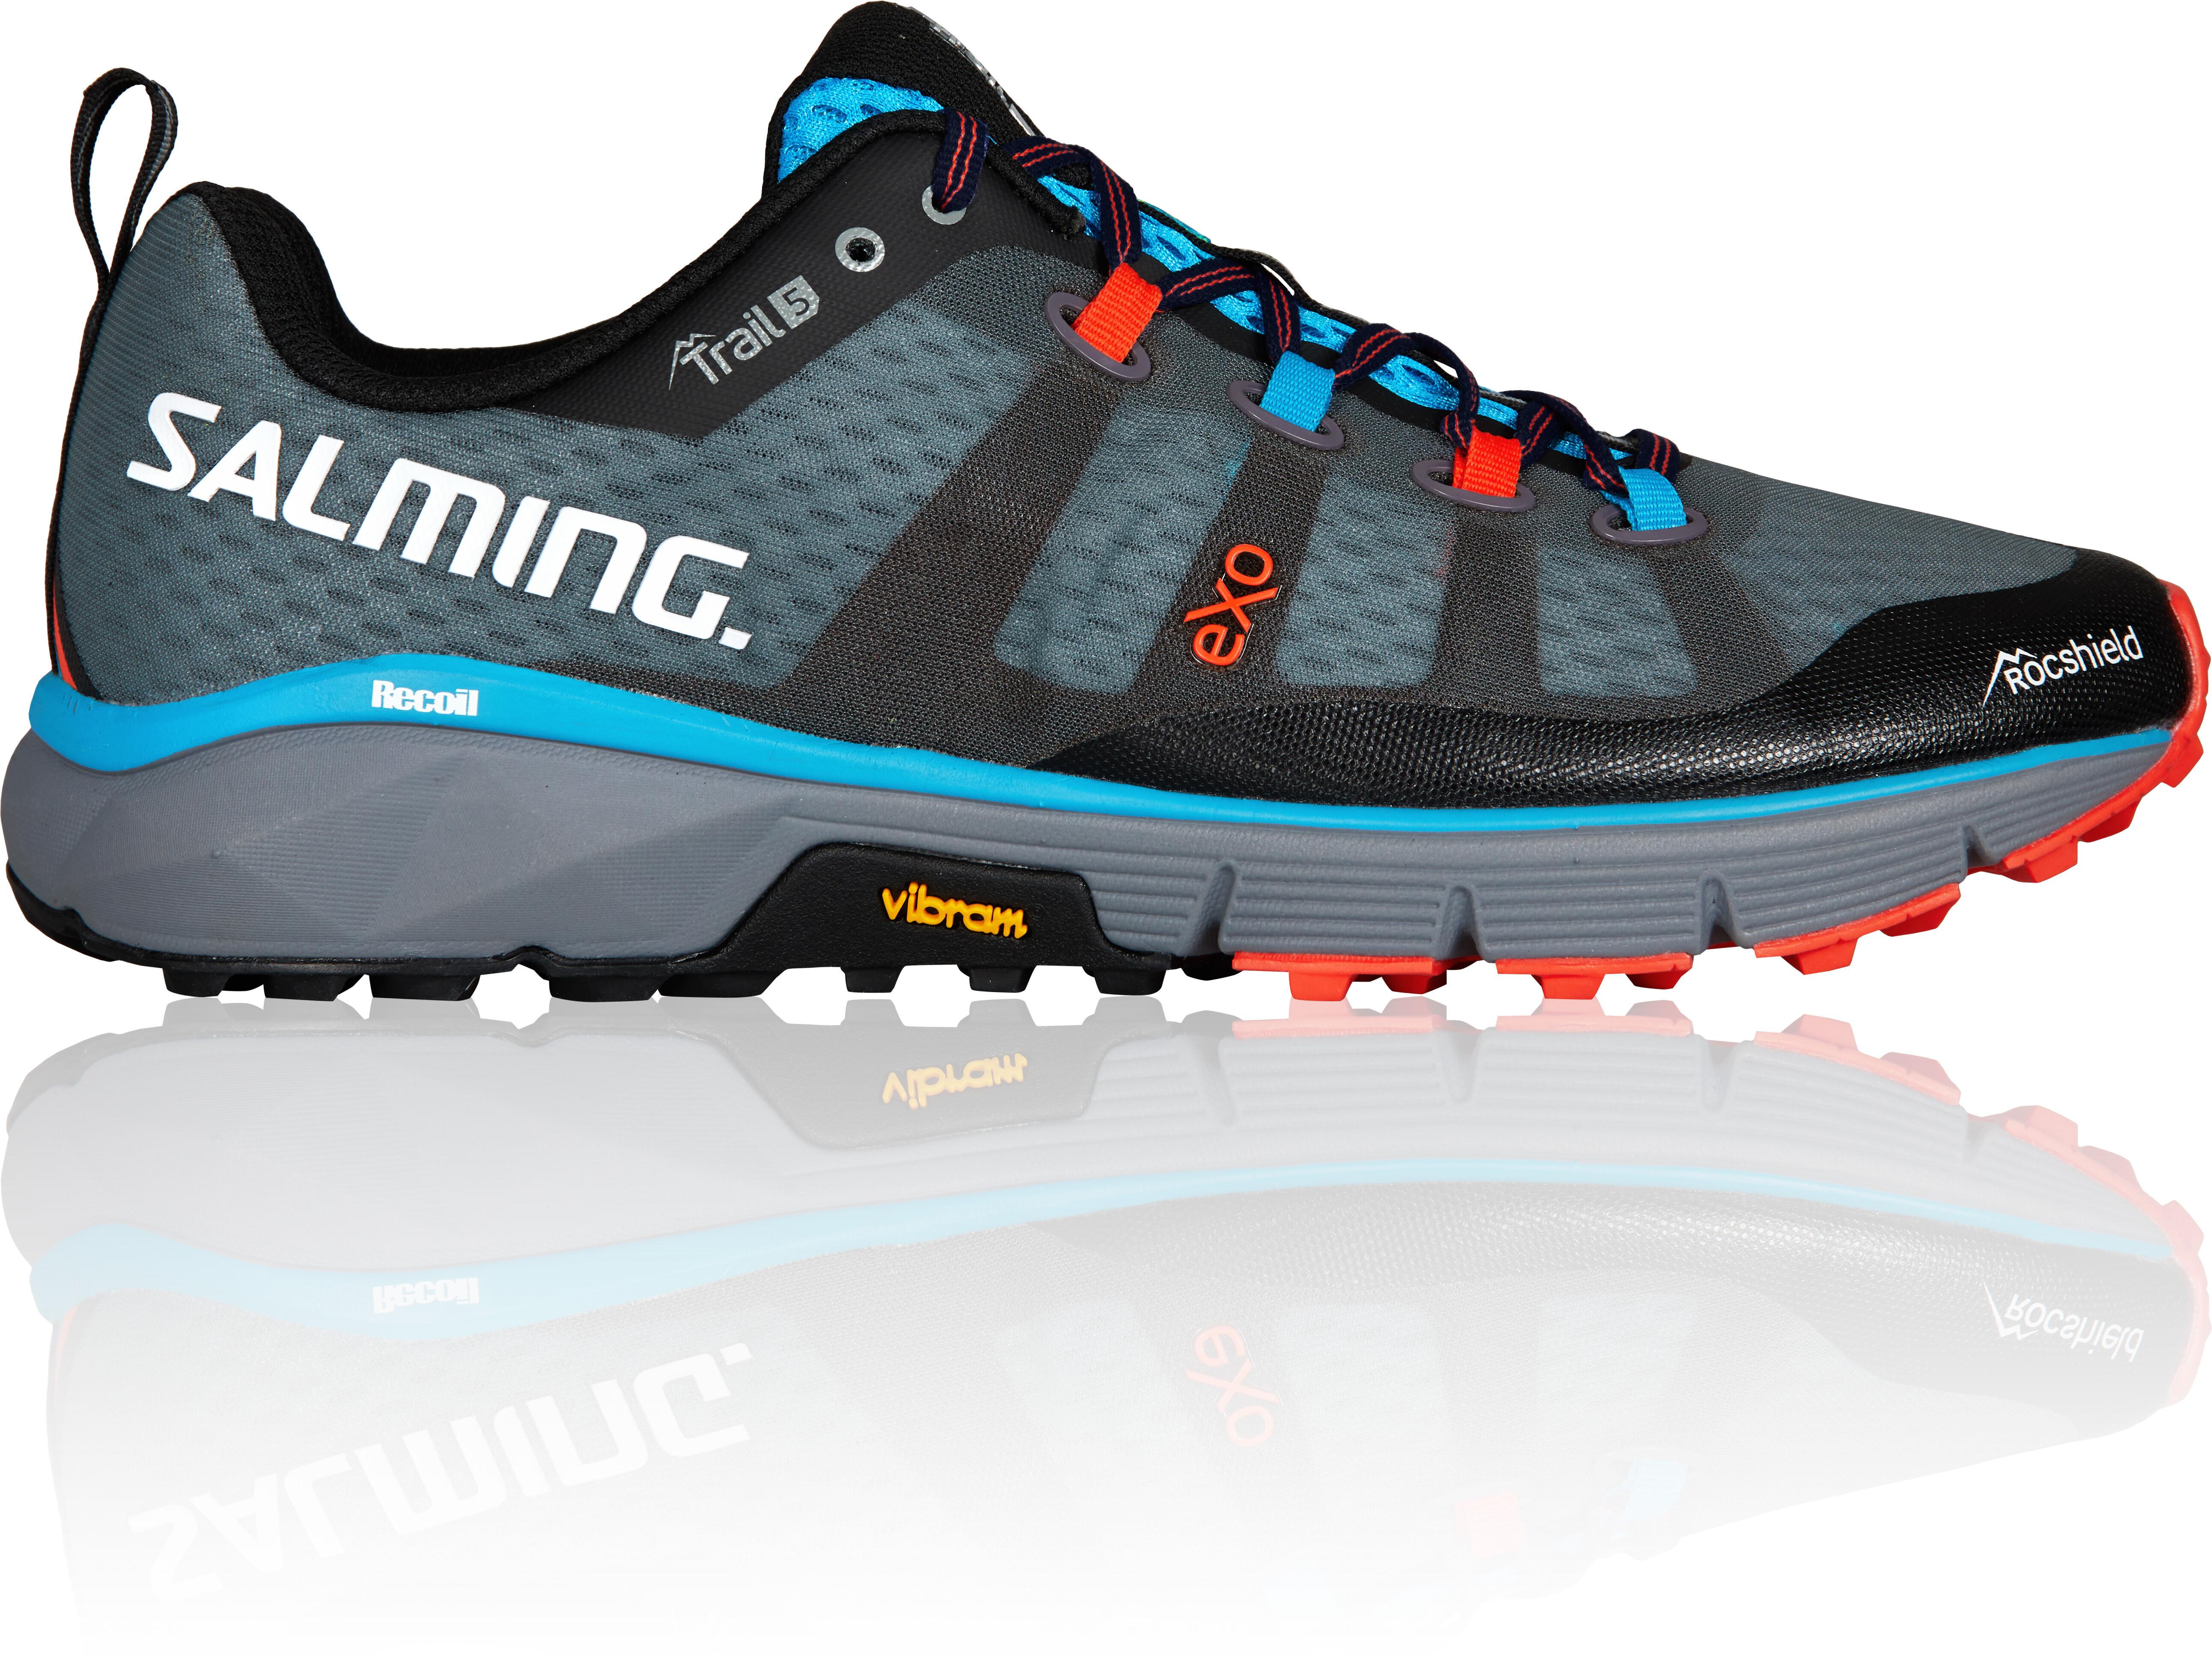 separation shoes d0de8 2aa78 Salming Trail 5 Löparskor Herr grå svart